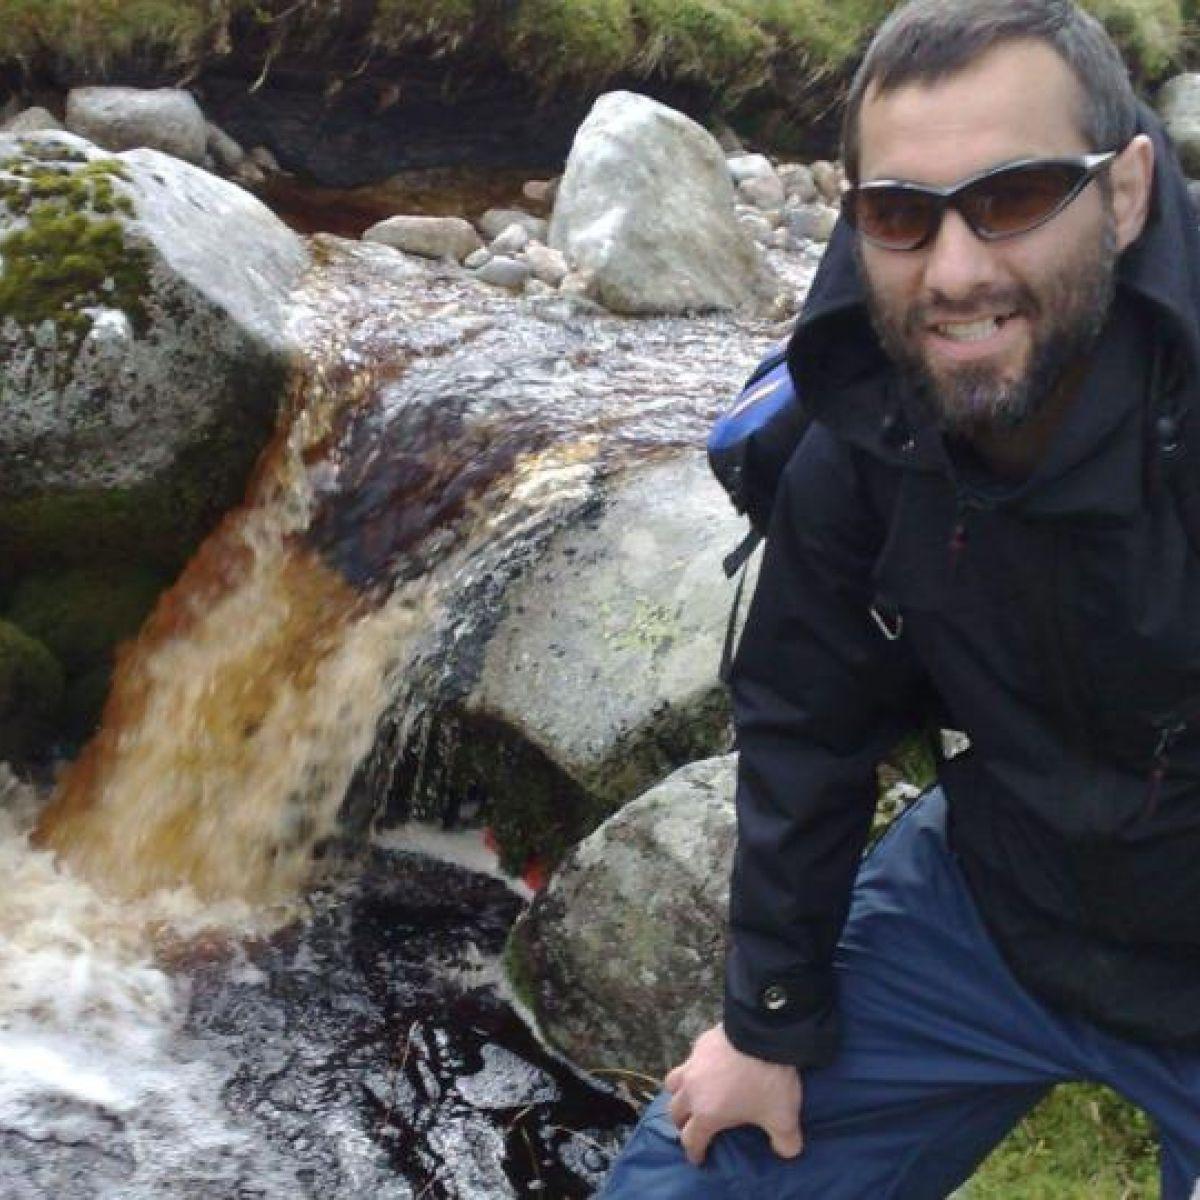 Alexandr Bekmirzaev: 'A victim of true Islamic brainwashing'